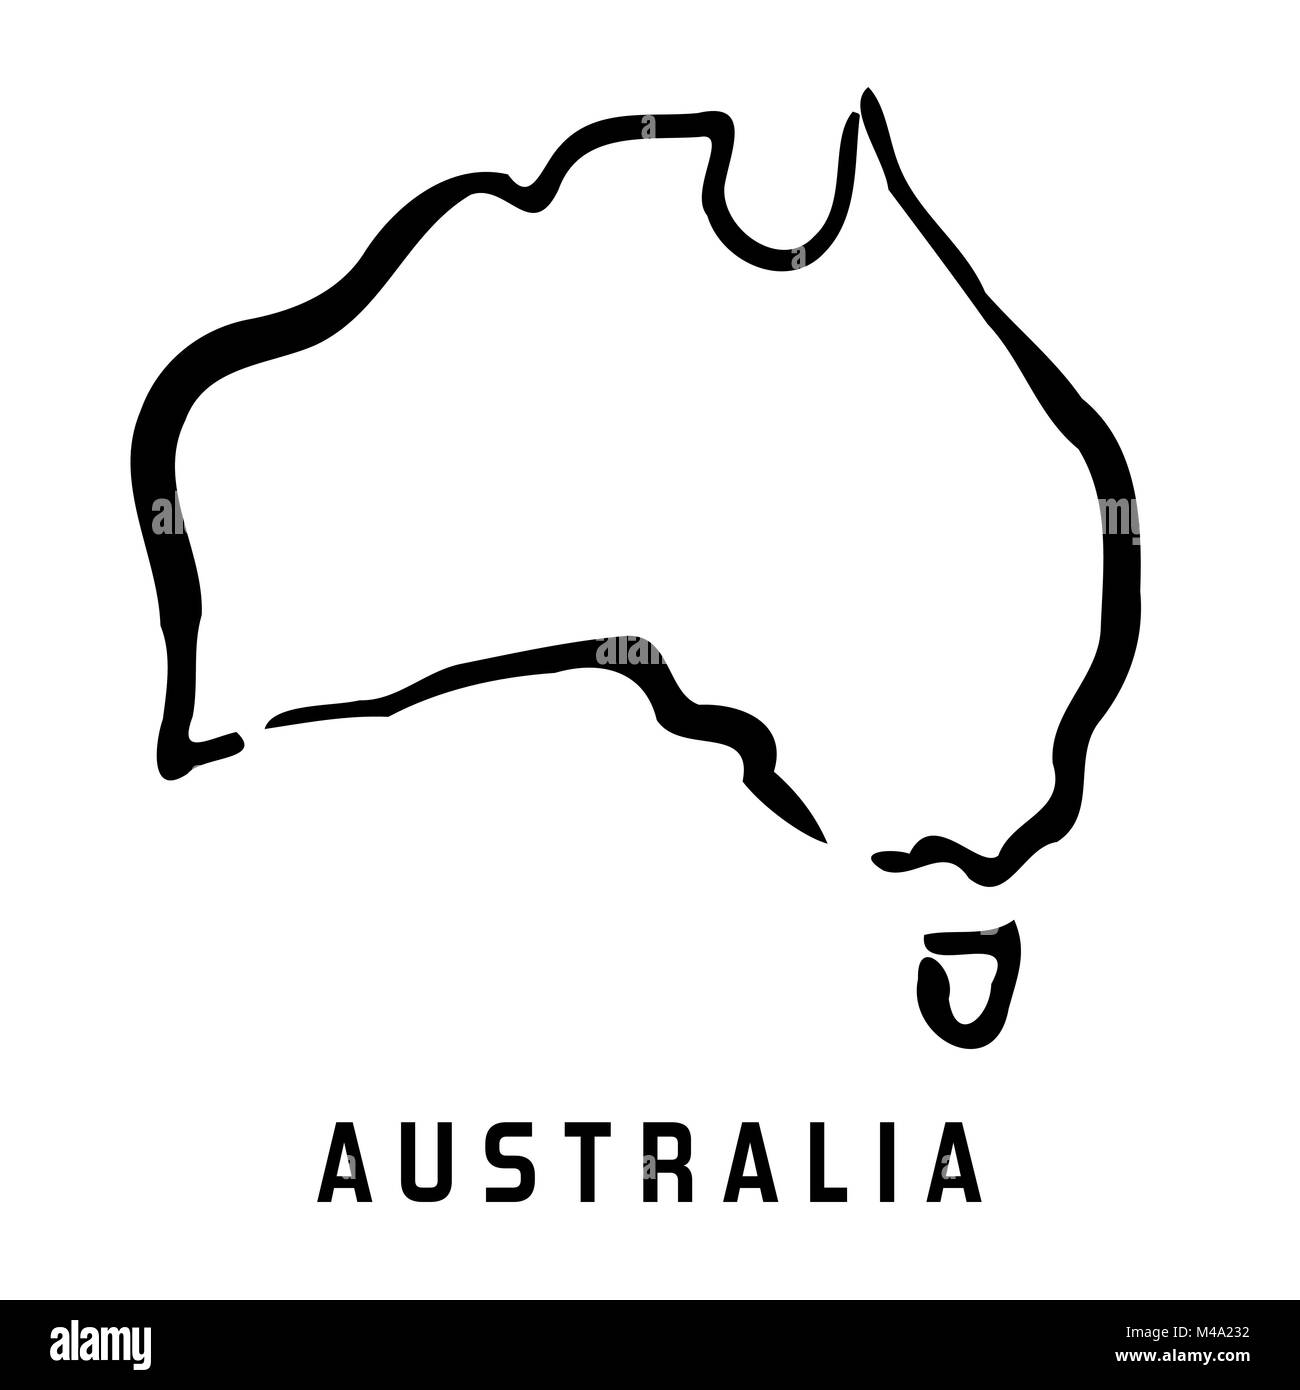 simple tasmania map, simple myanmar map, simple mediterranean map, simple south asia map, simple russian federation map, simple carribbean map, simple okinawa map, simple u.s. map, simple land use map, simple denmark map, simple south america map, simple bolivia map, simple switzerland map, simple china map, simple western front map, simple austria map, simple colombia map, simple guam map, simple basque country map, simple parking map, on simple australia map